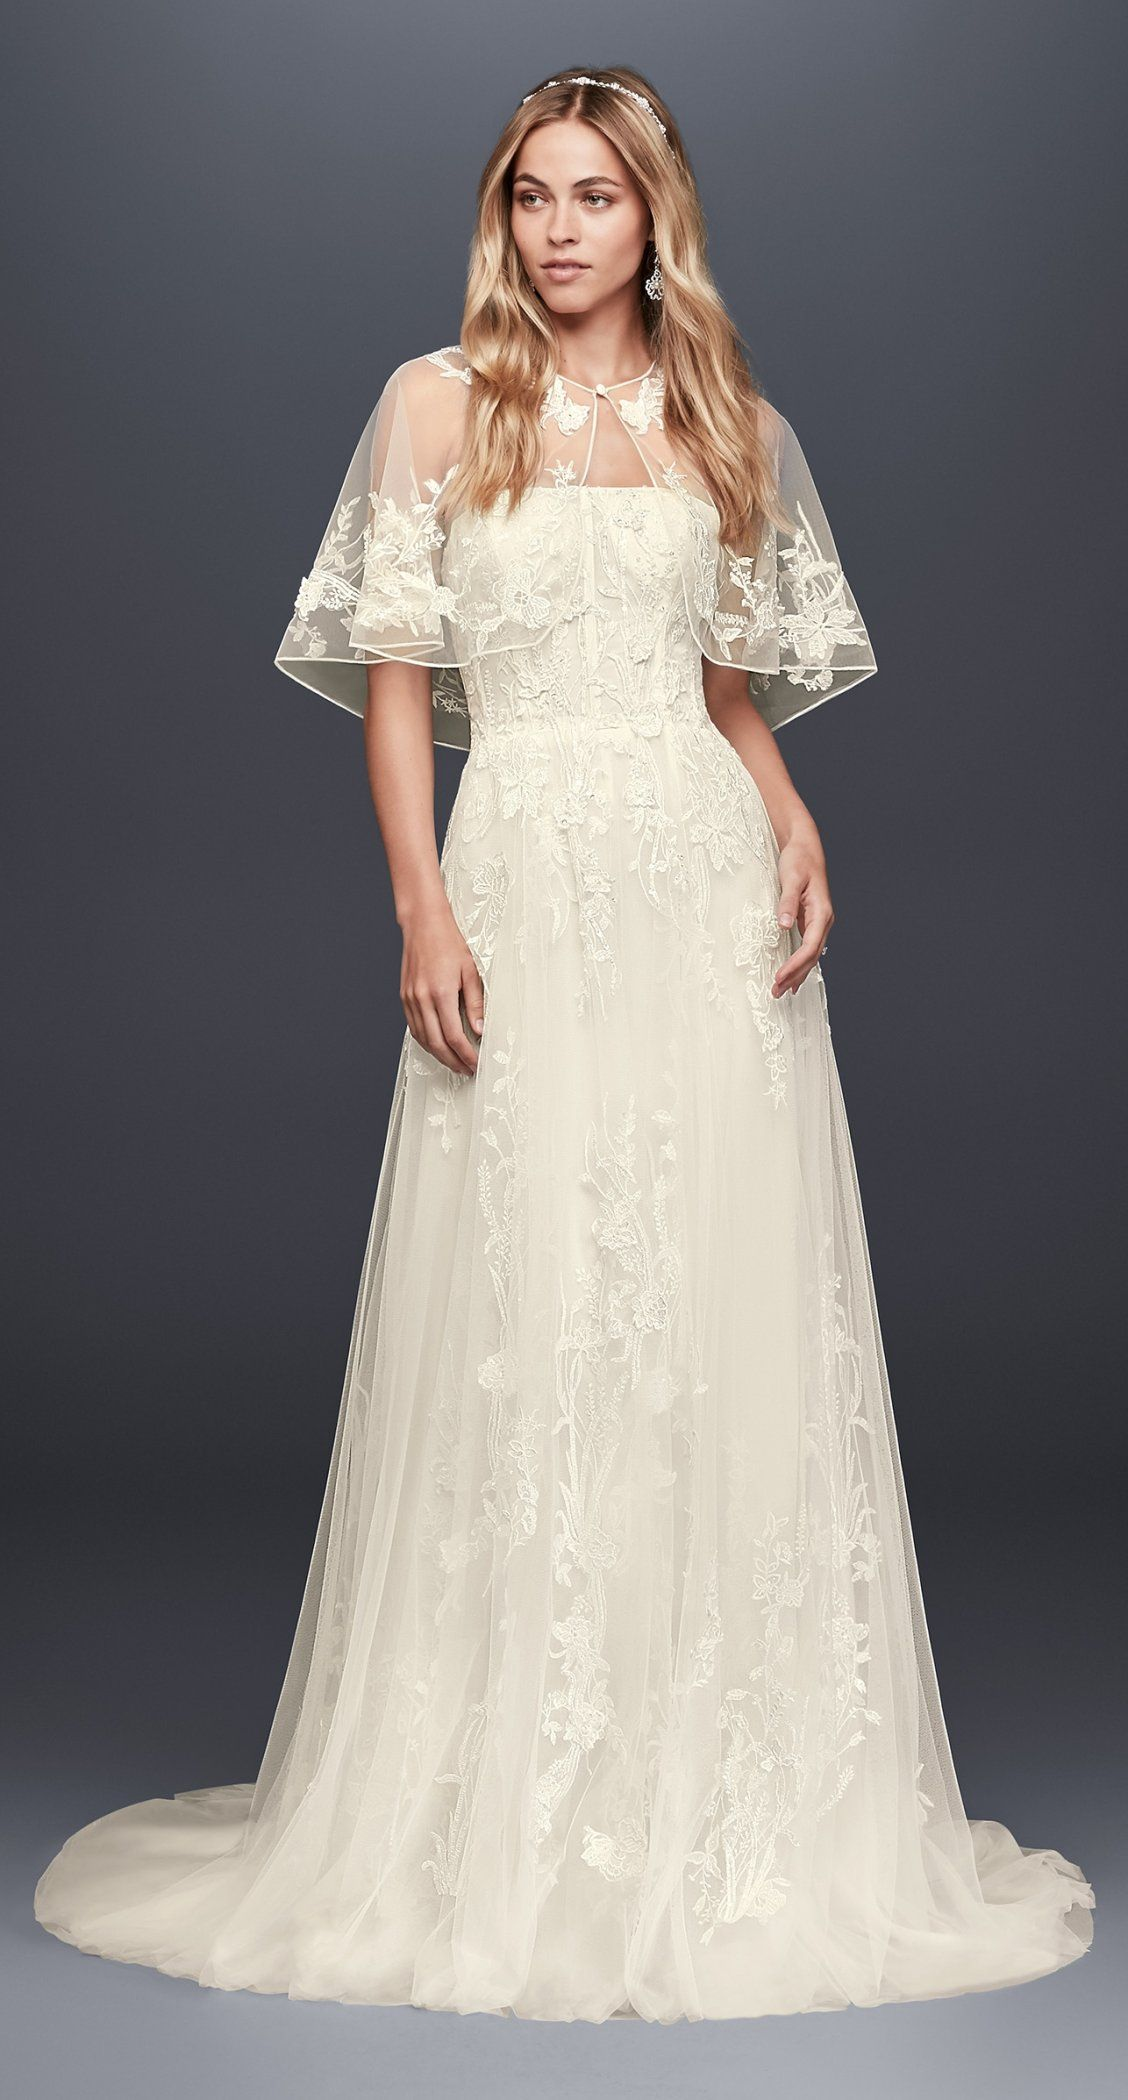 Trailing Floral Lace Wedding Gown With Capelet David S Bridal Hochzeitskleider Spitze Kleid Hochzeit Hochzeitskleider Vintage [ 2100 x 1128 Pixel ]